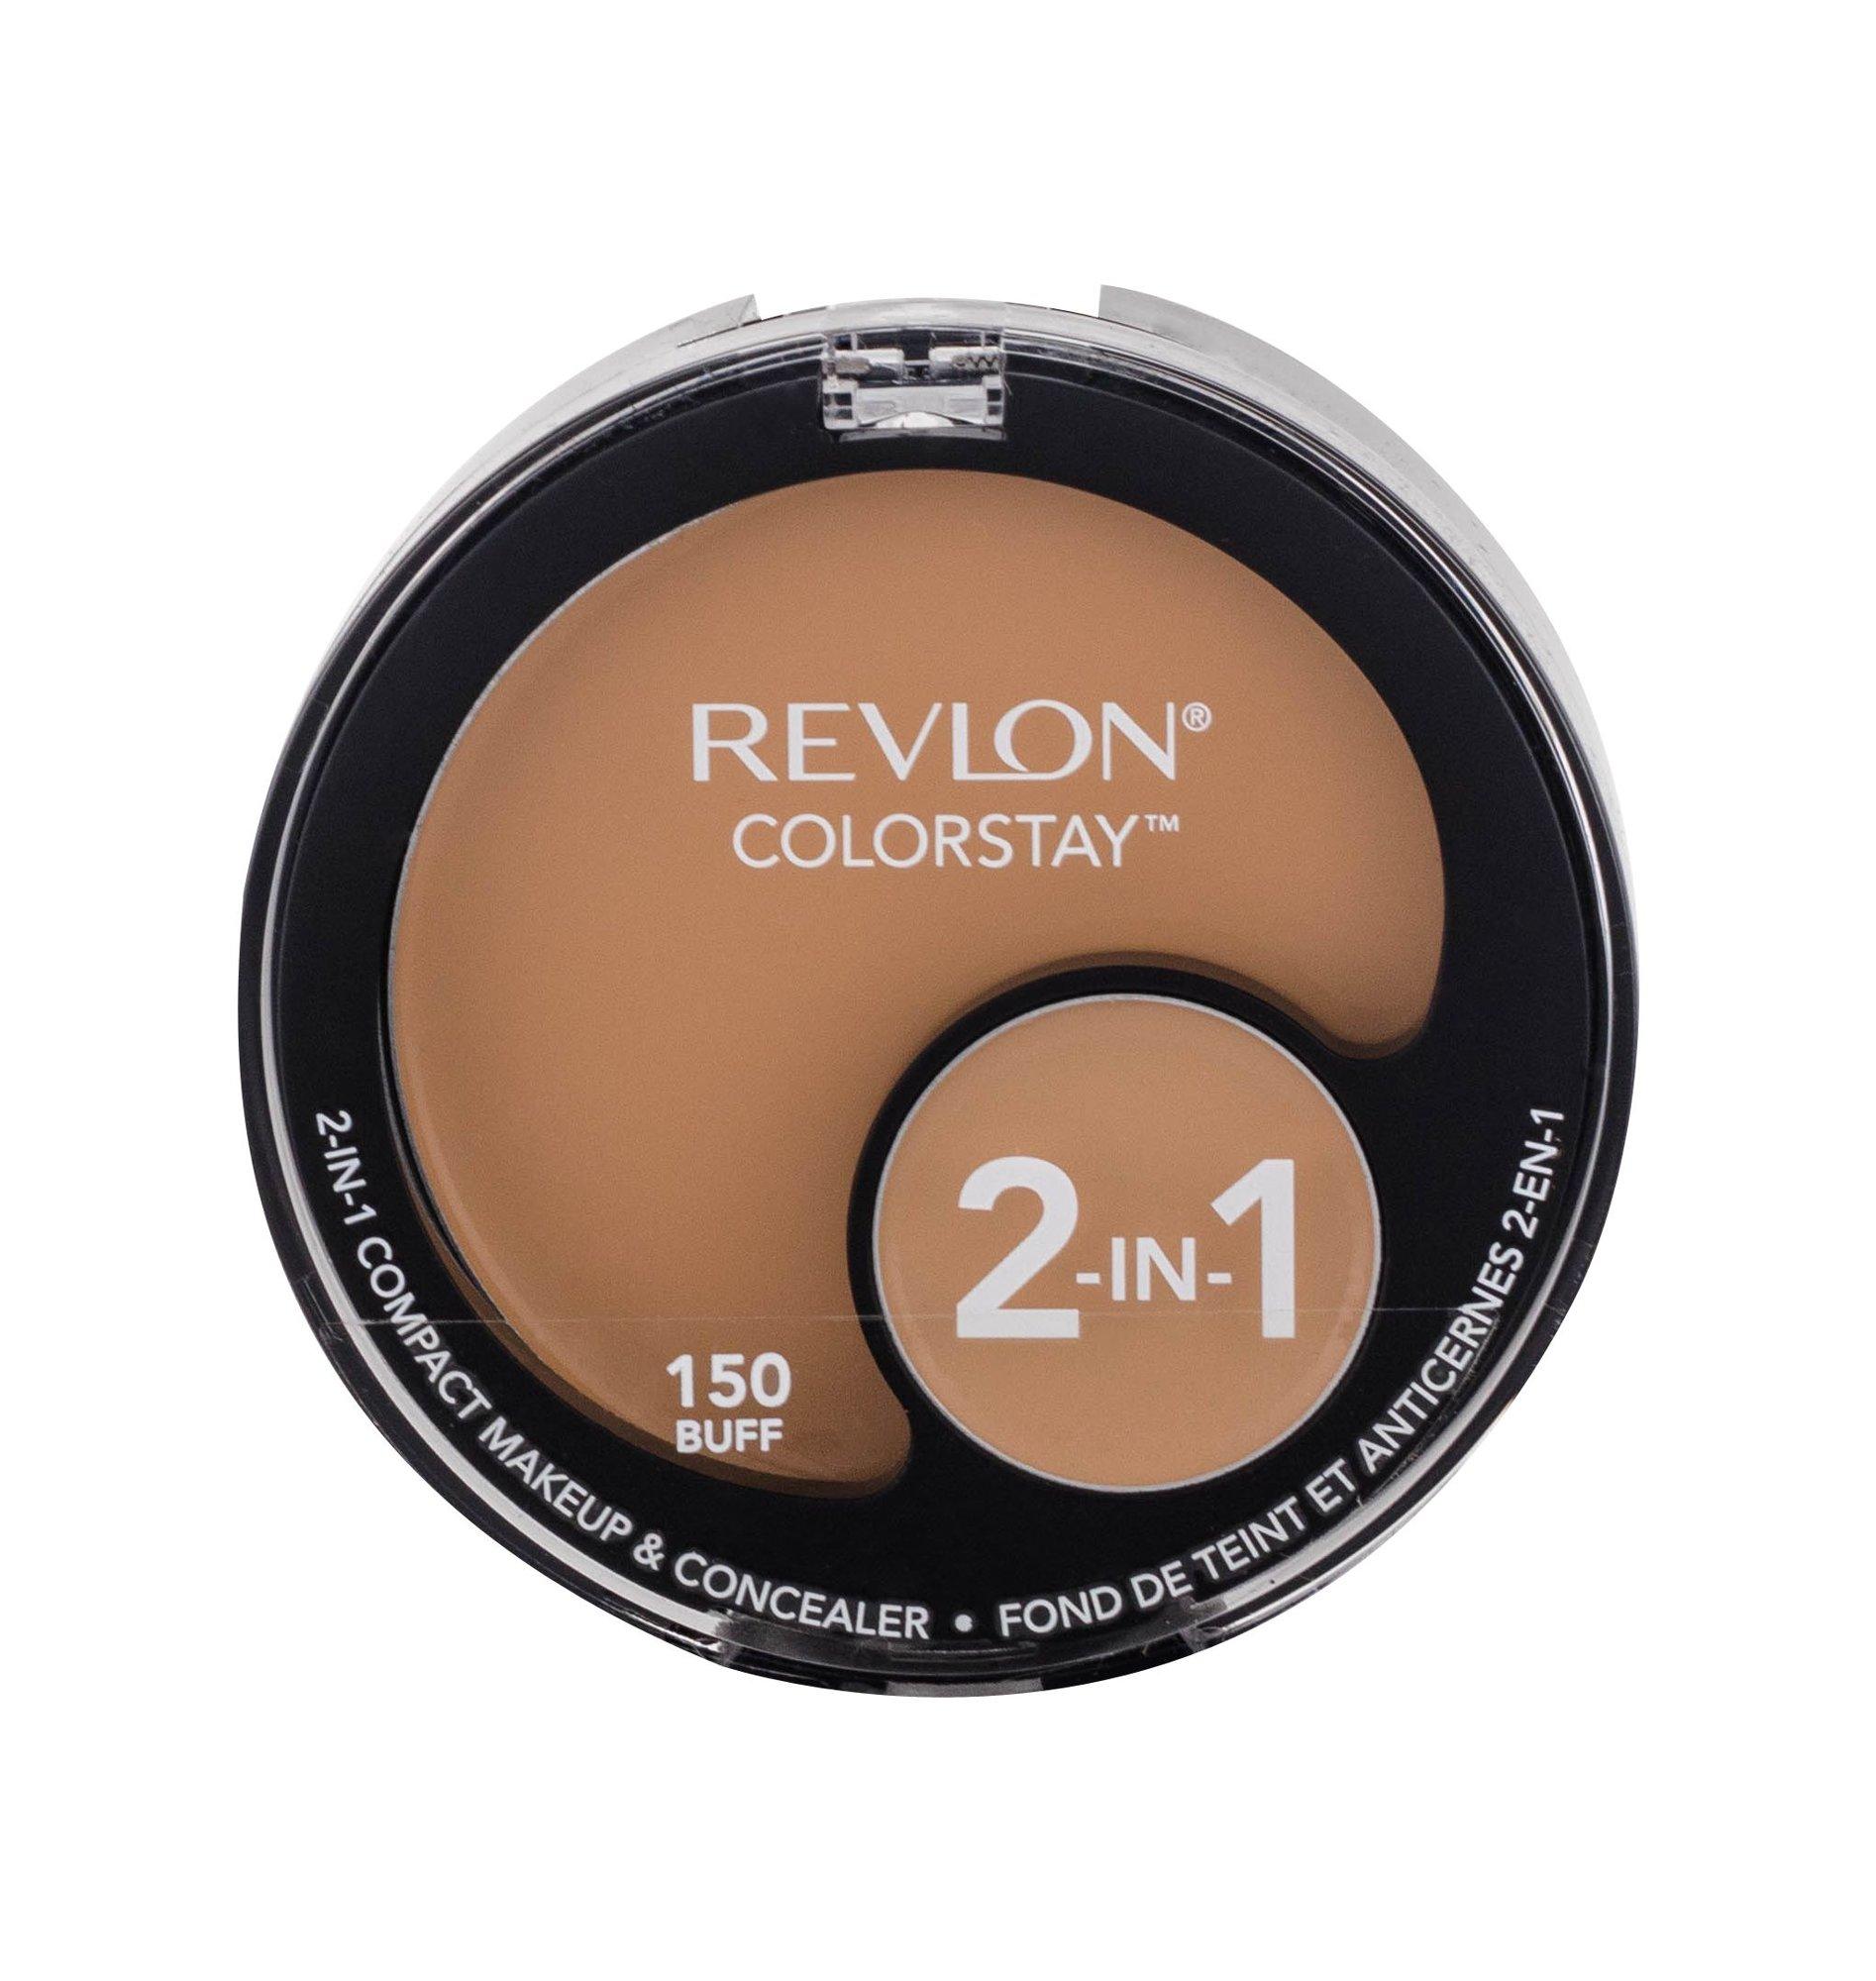 Revlon Colorstay Makeup 12,3ml 150 Buff